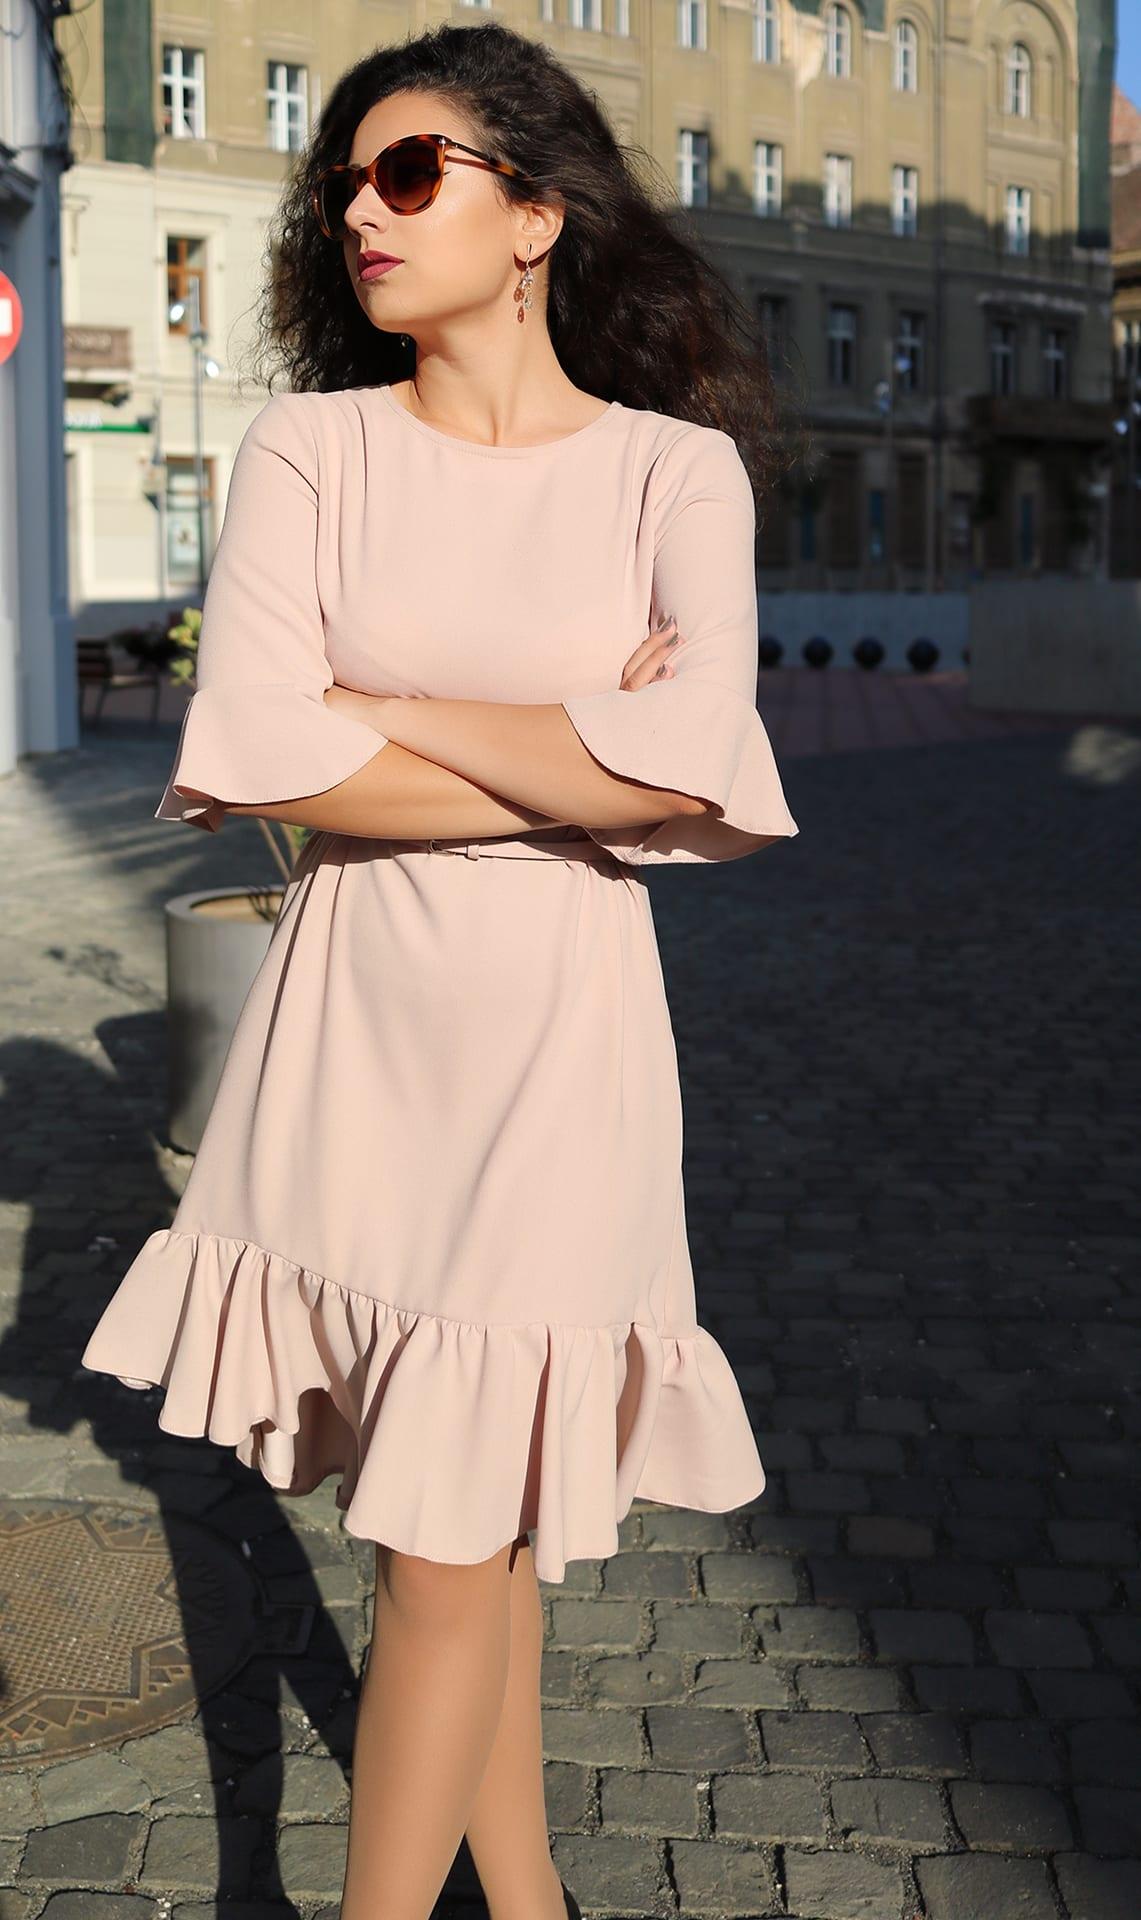 Roxi Rose Woman Fashion Ro Rochie Sacou Flared volanase